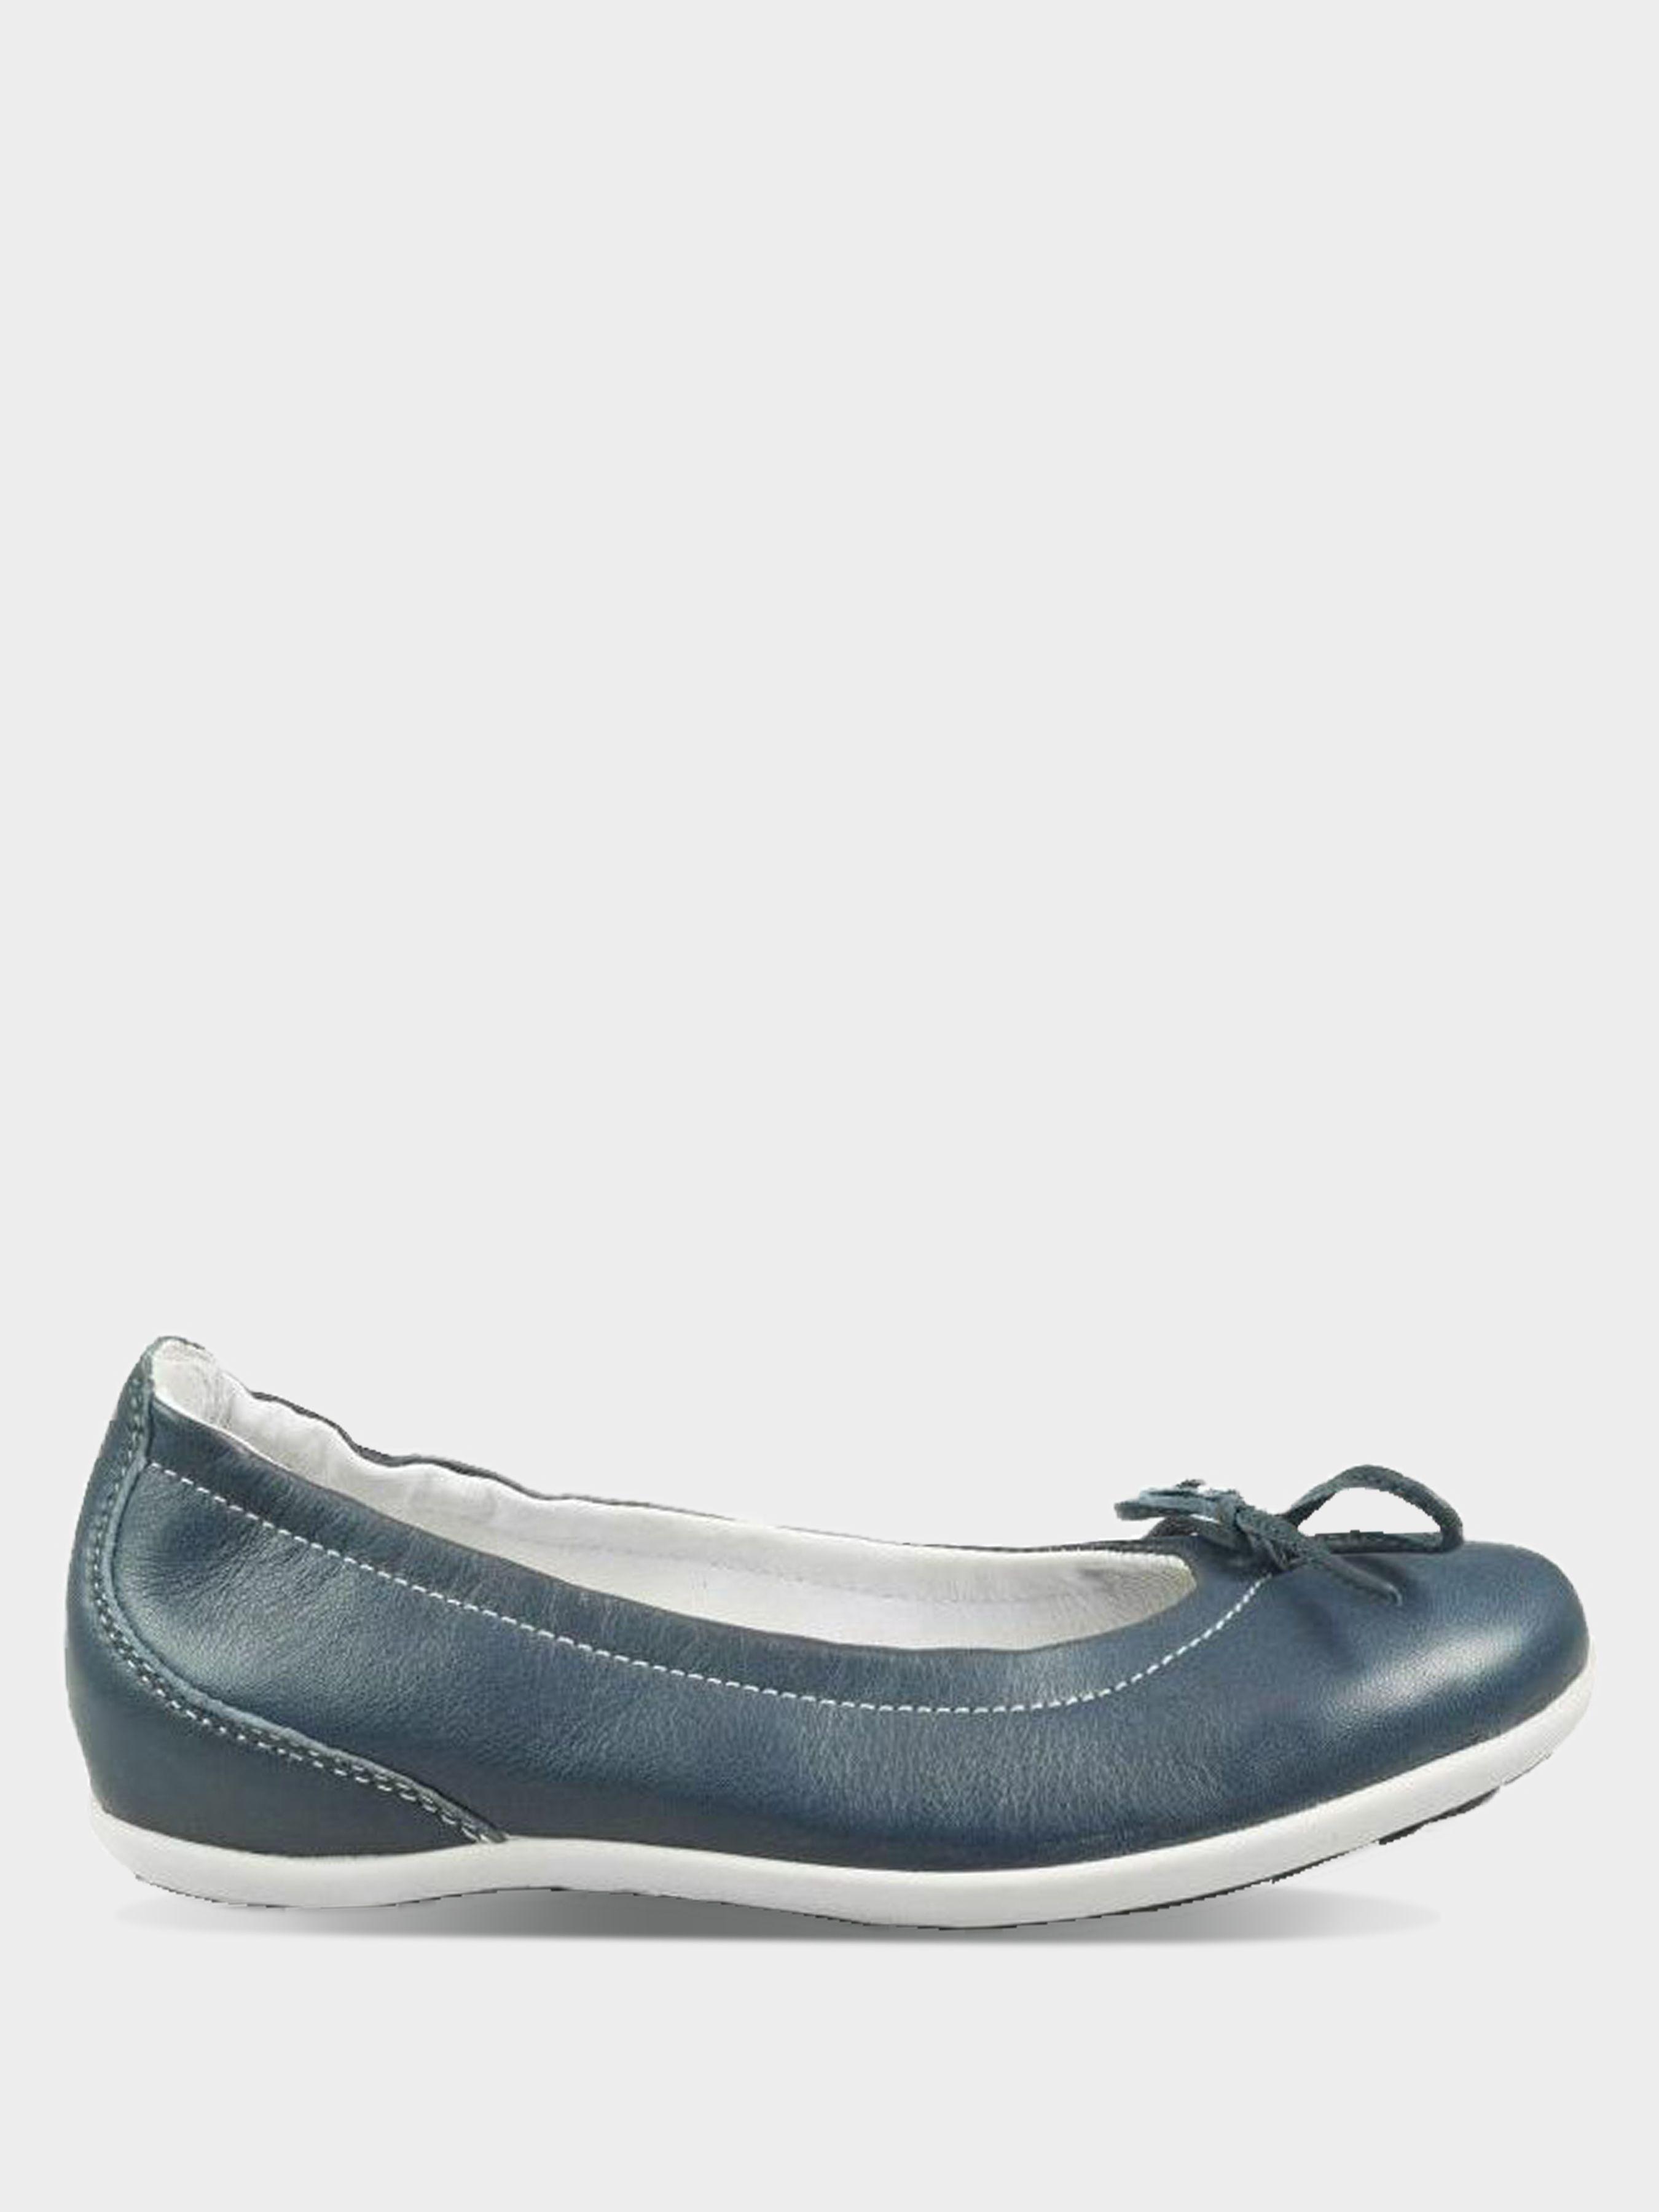 Туфли для детей IMAC HILARY 1Z9 цена, 2017